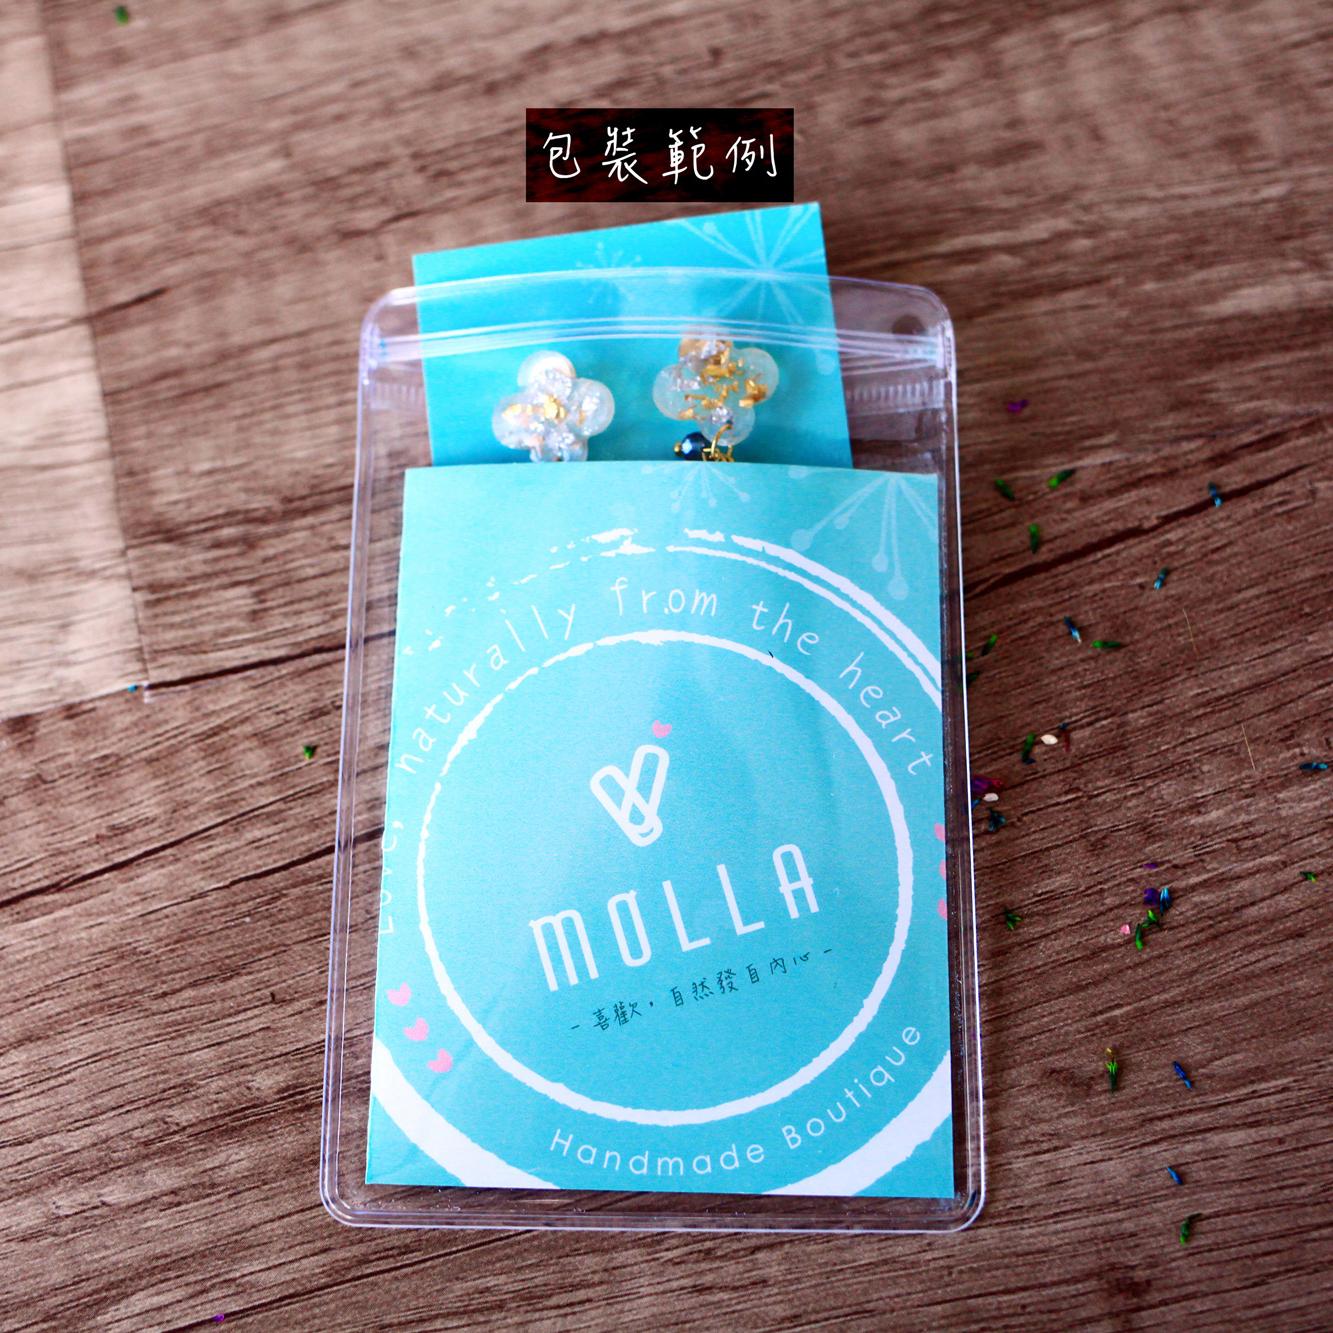 Molla 藍色奇幻海洋-小海豚吊飾(女生最愛手作吊飾、鑰匙圈、包包吊飾)